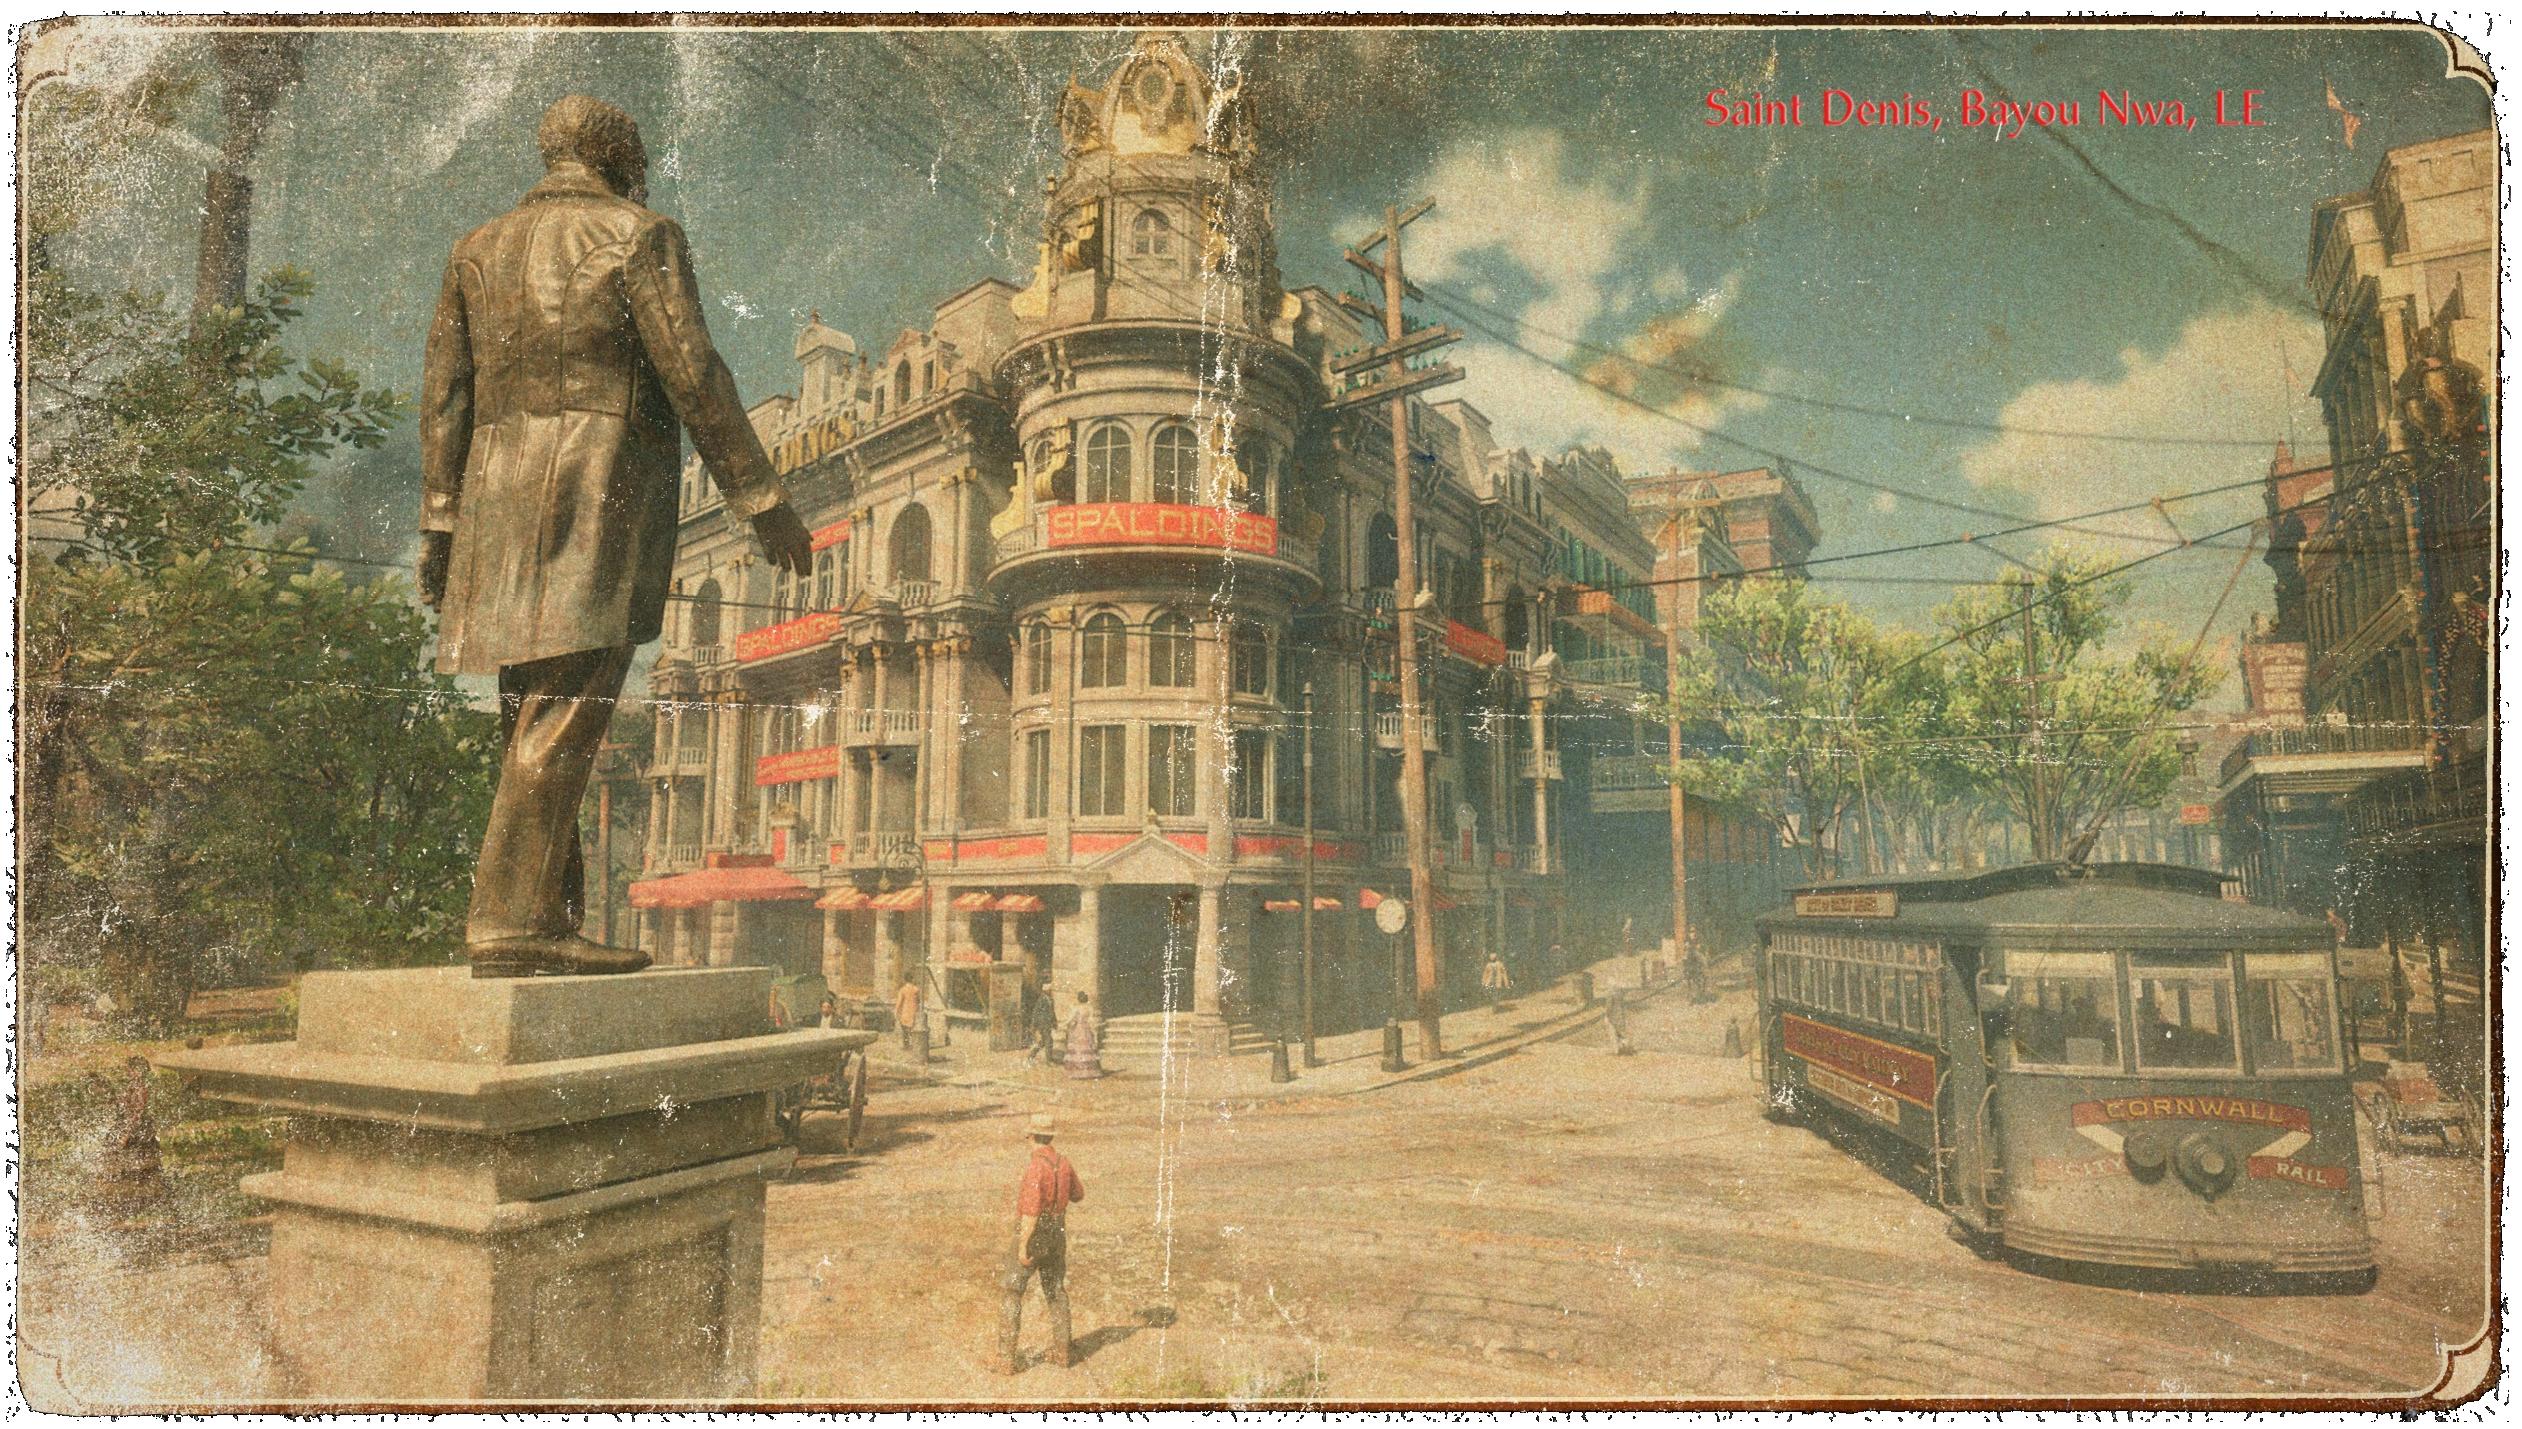 carte postale Saint-Denis